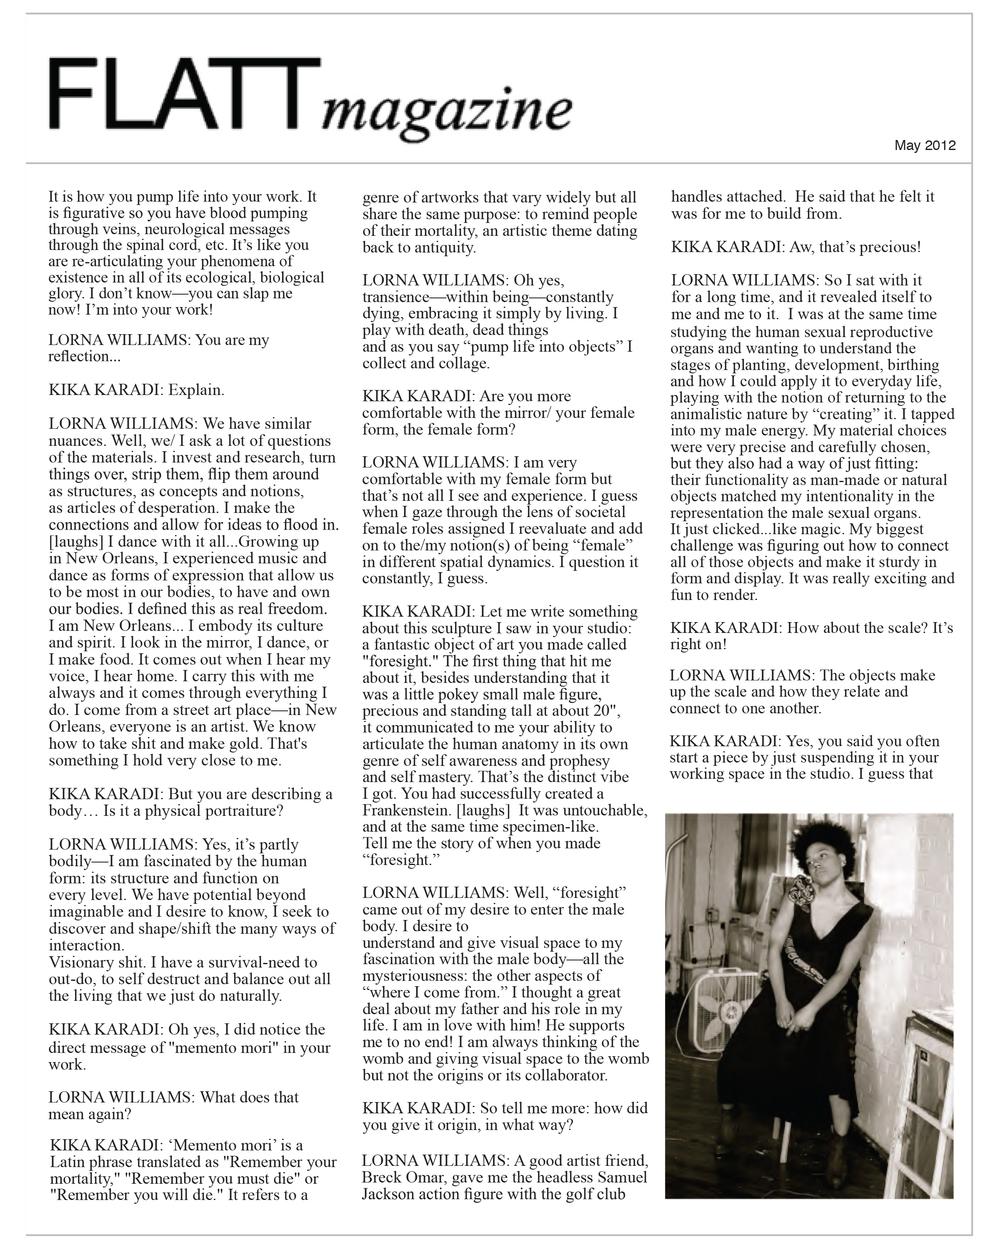 FlattMagazine_3_May 2012.jpg